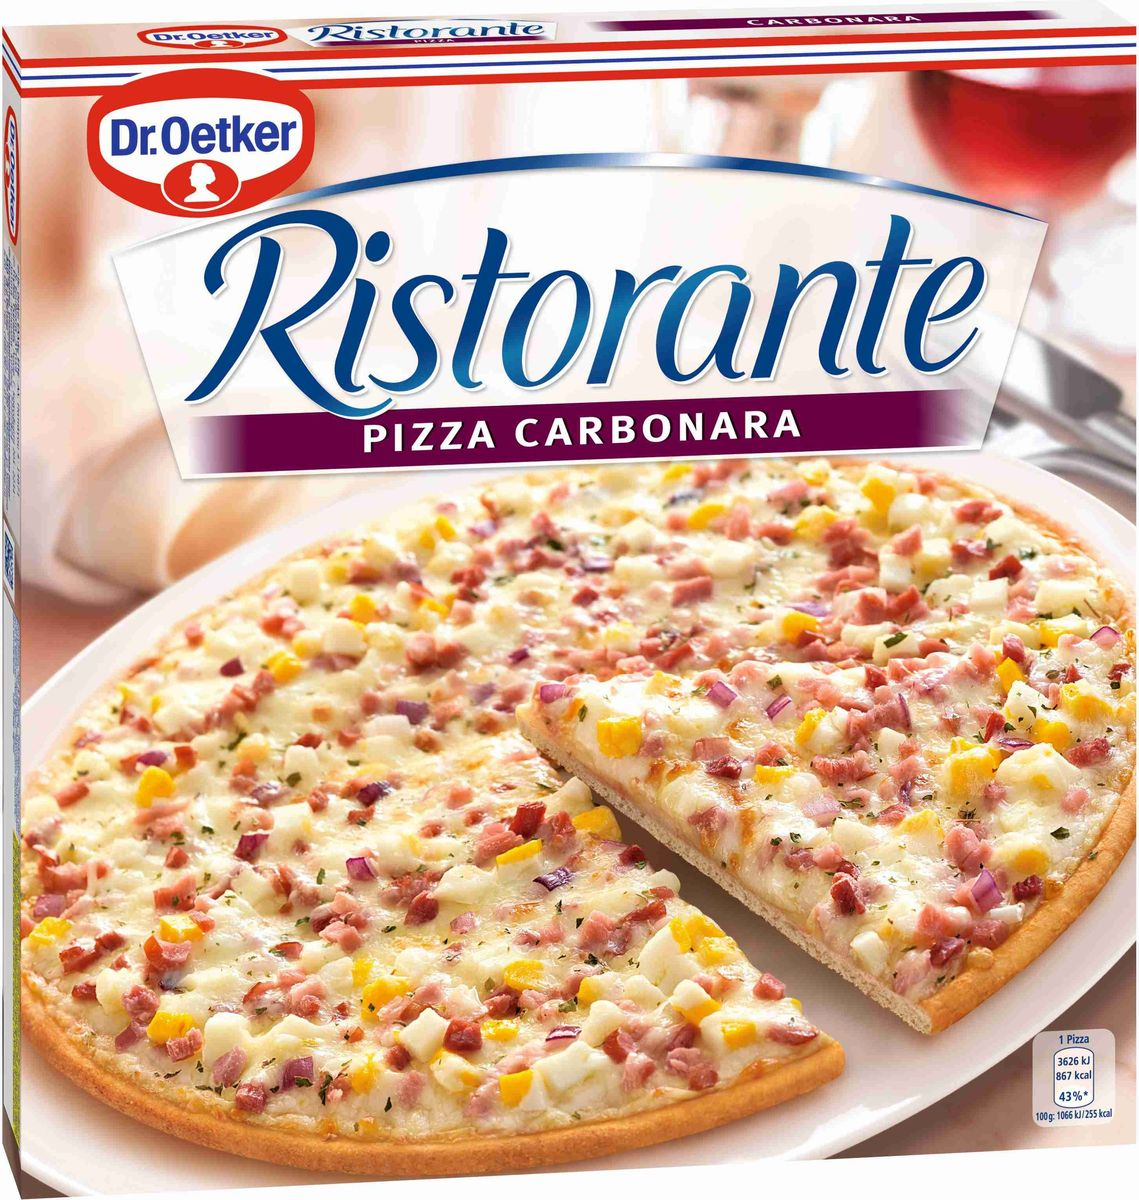 Dr.Oetker Пицца Ristorante Карбонара, 340 г15963Пицца Ристоранте Карбонара. Пицца обильно покрытаветчиной, яйцами и сыром на тонком хрустящем тесте. Пицца глубокойзаморозки. Хранить при температуре -18С.